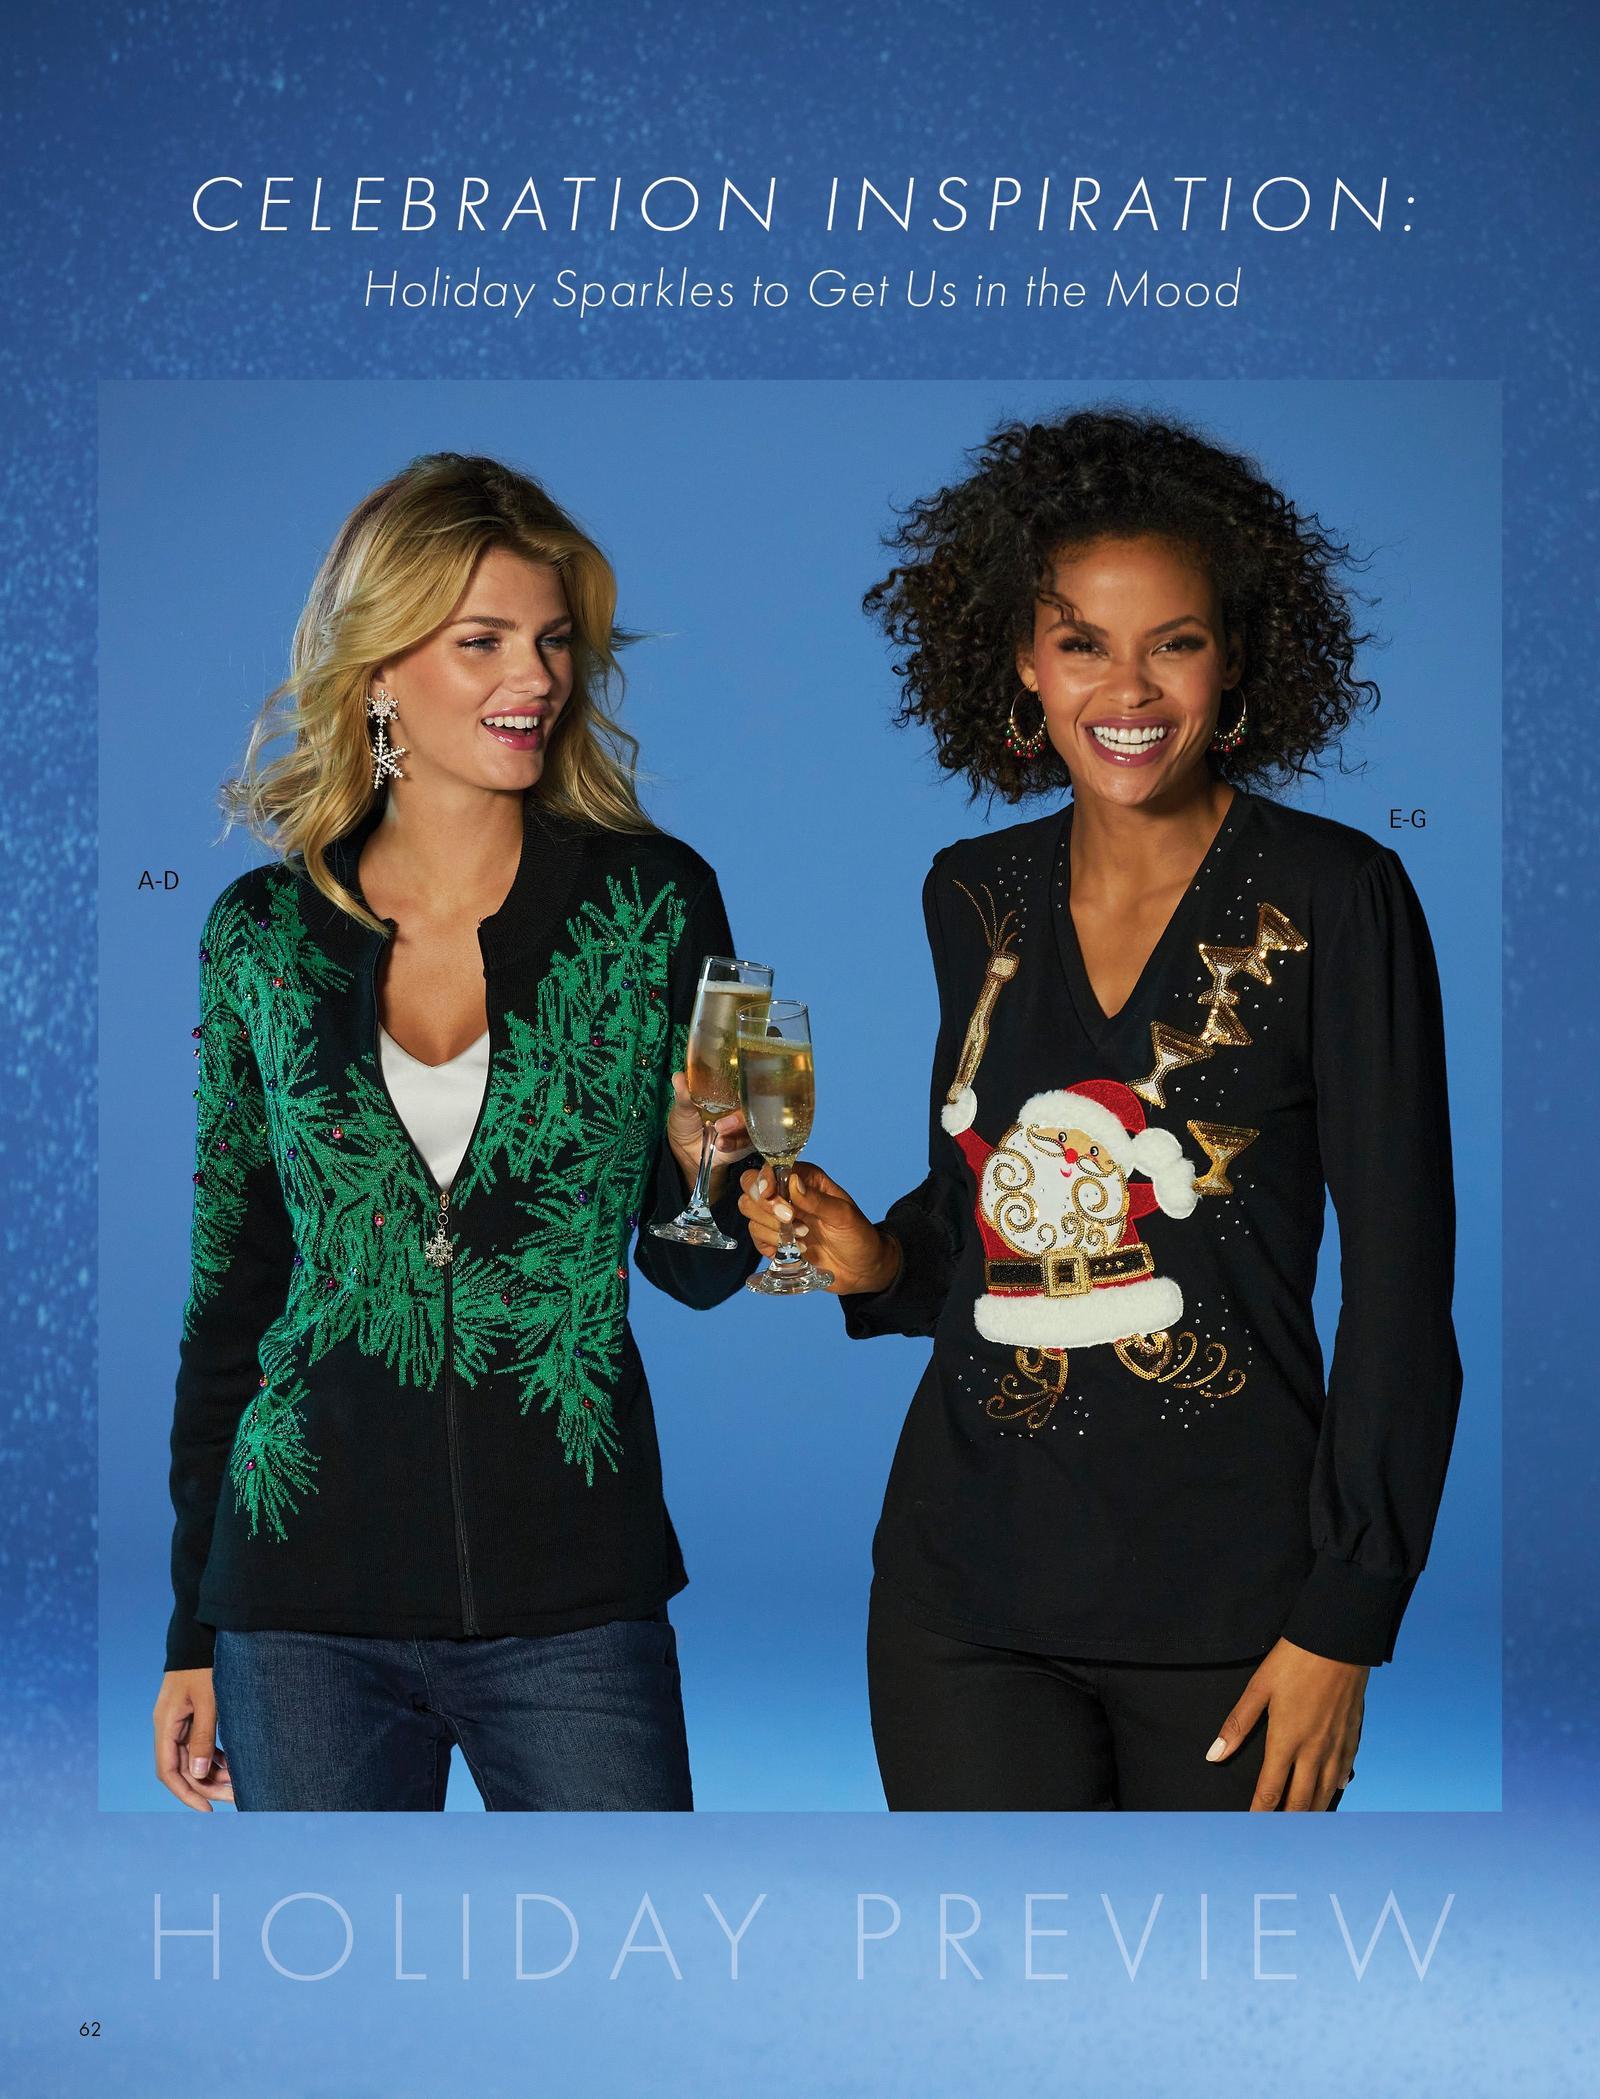 left model wearing a festive tree zip-up cardigan sweater, white v-neck top, jeans, and snowflake earrings. right model wearing a black long-sleeve santa puff-sleeve tee, black jeans, and jingle bell hoop earrings.